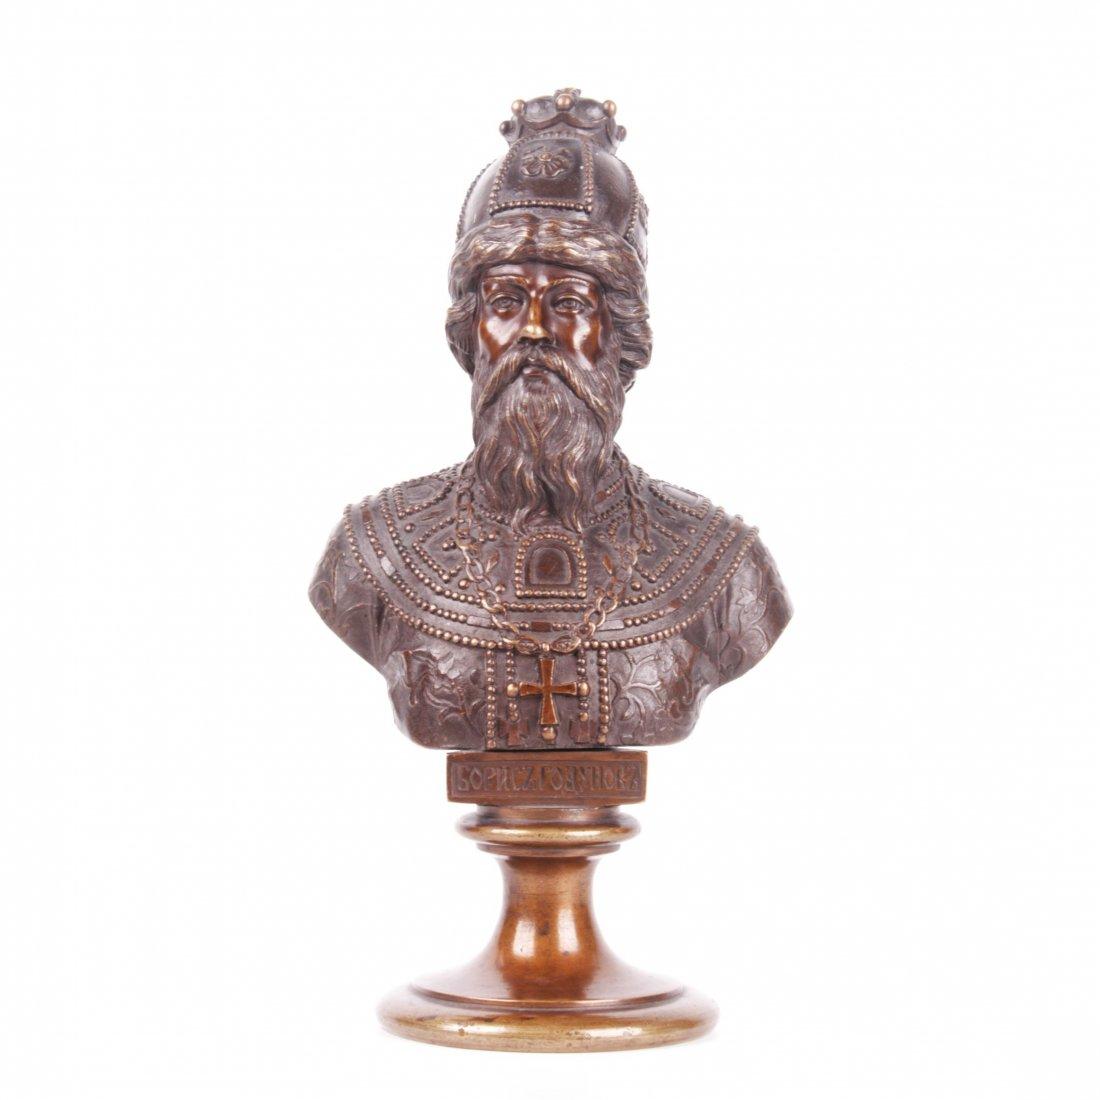 Chopins-bust-gallery - Boris-godunov-bronze-bust-russia-chopin-cyrillic